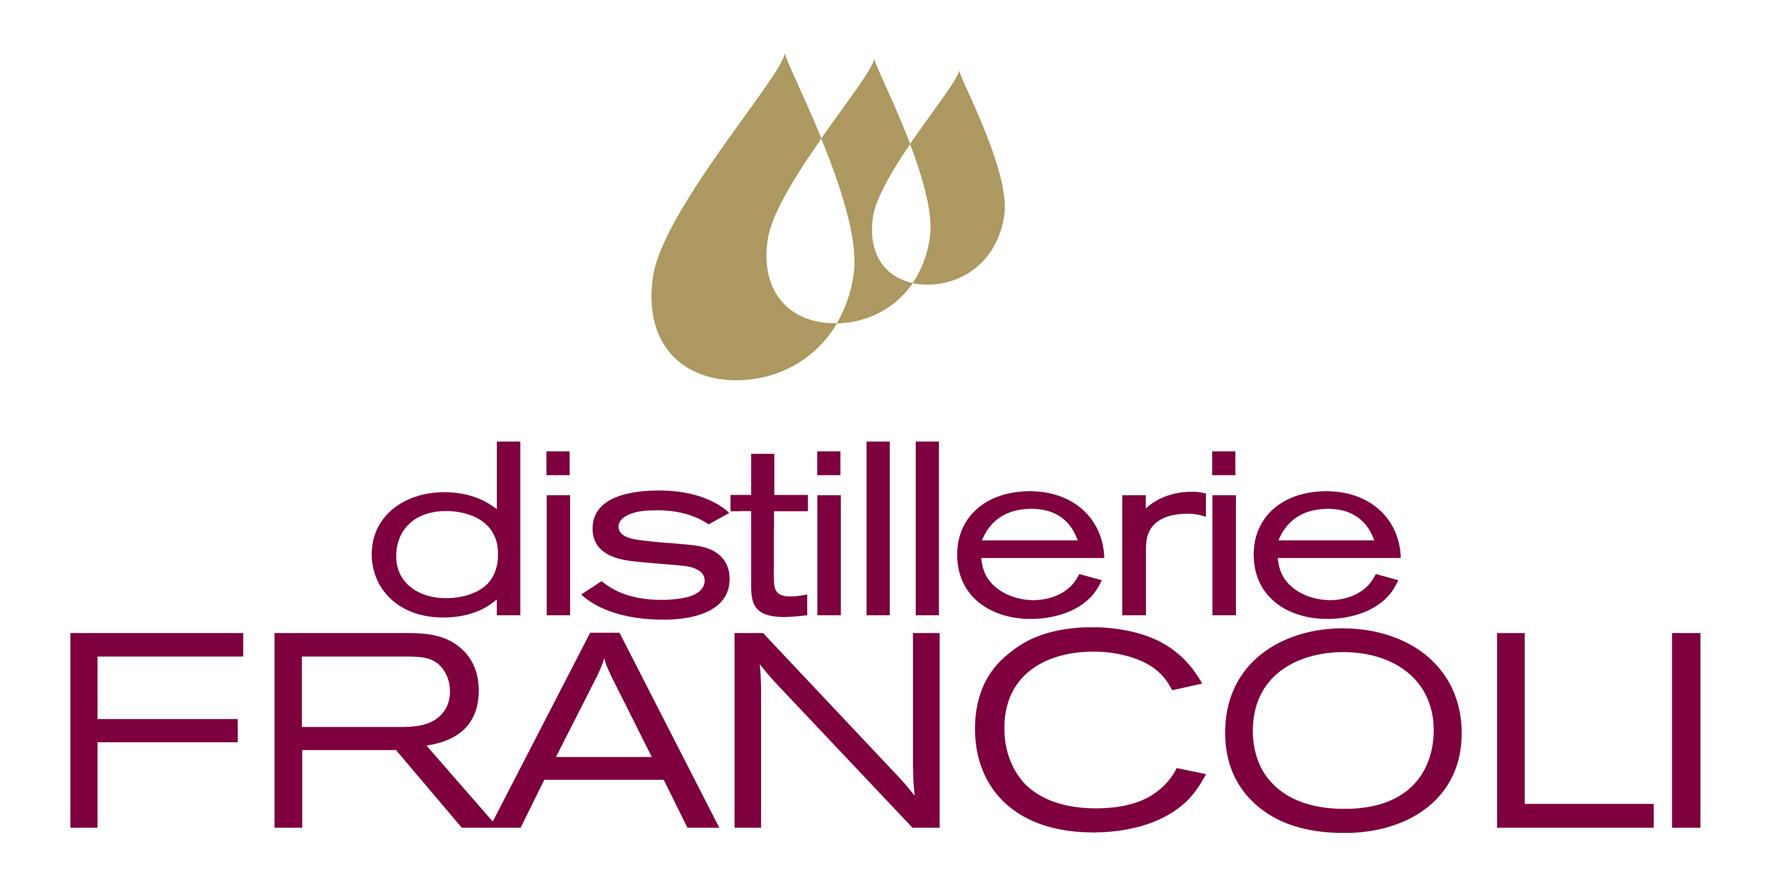 Cantina vitivinicola Francoli Distillerie